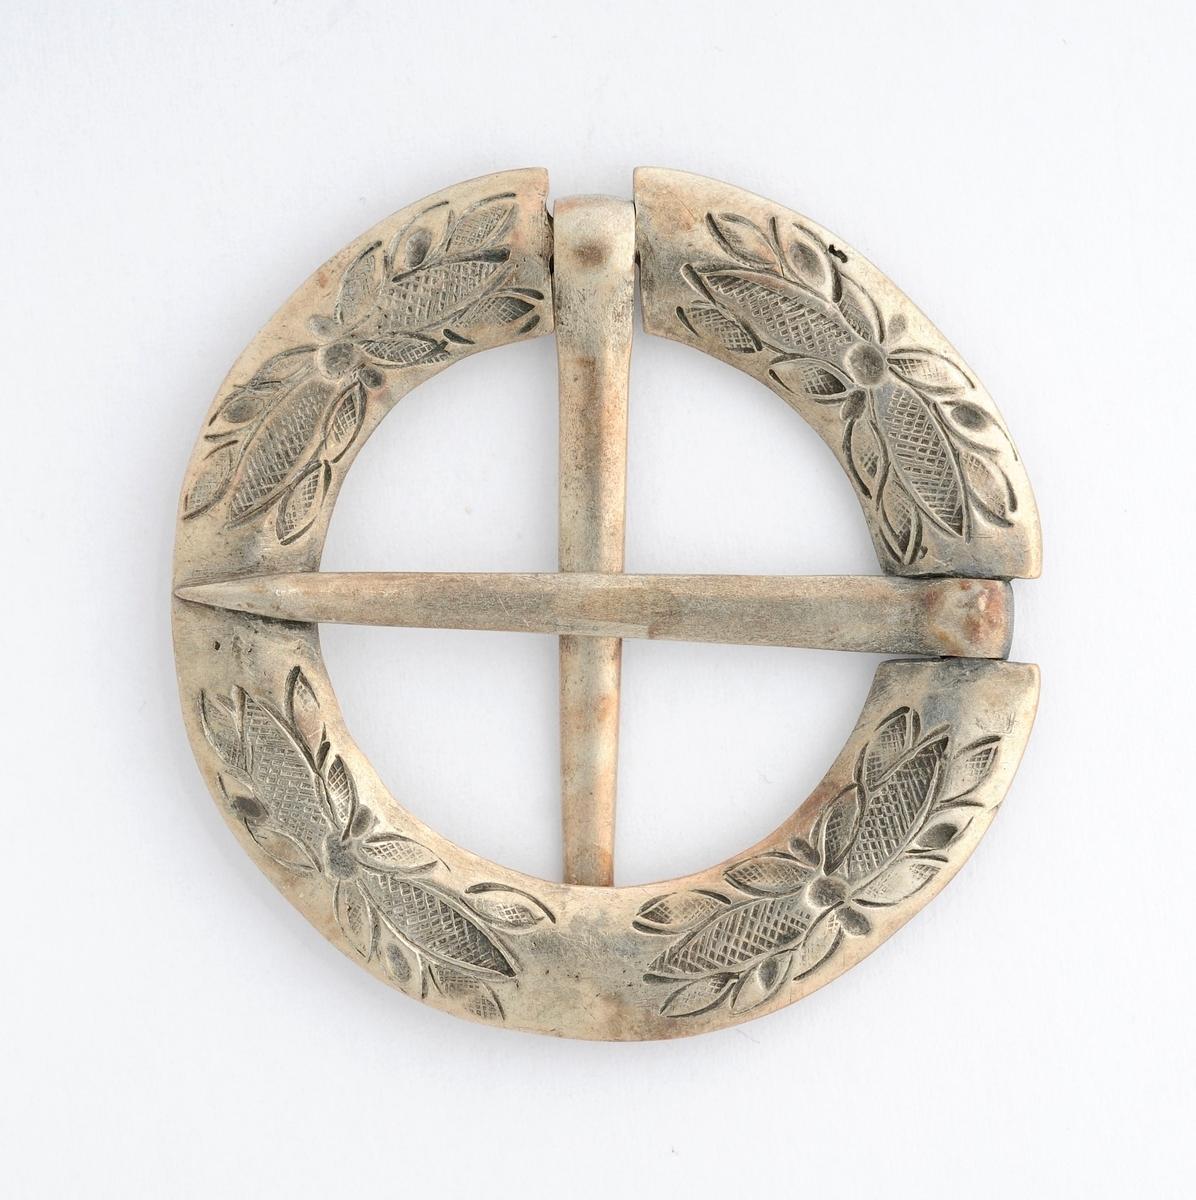 Sølje, krossnål i sølv (utan stempel). Rund, (støypt ?) med to nåler i kors. Den eine nåla er fastlodda. Gravert rosemønster på framsida. Glatt på baksida.